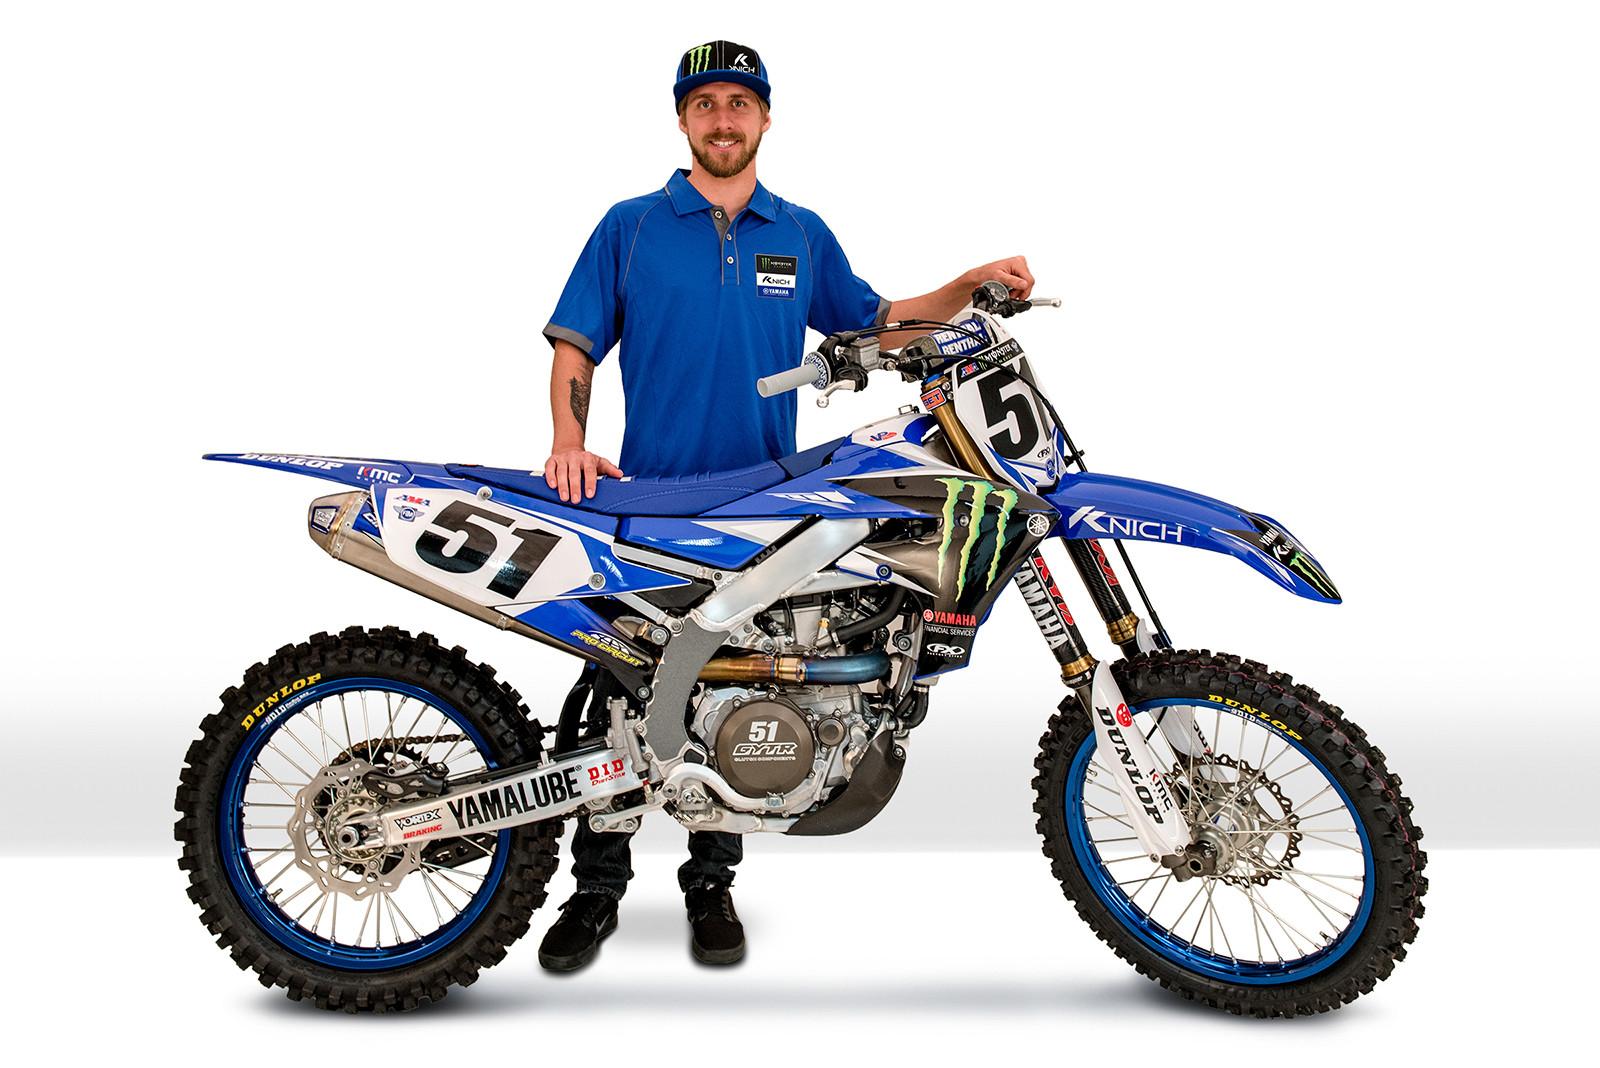 Monster Energy/Knich/Yamaha Factory Racing Team Rider Updates